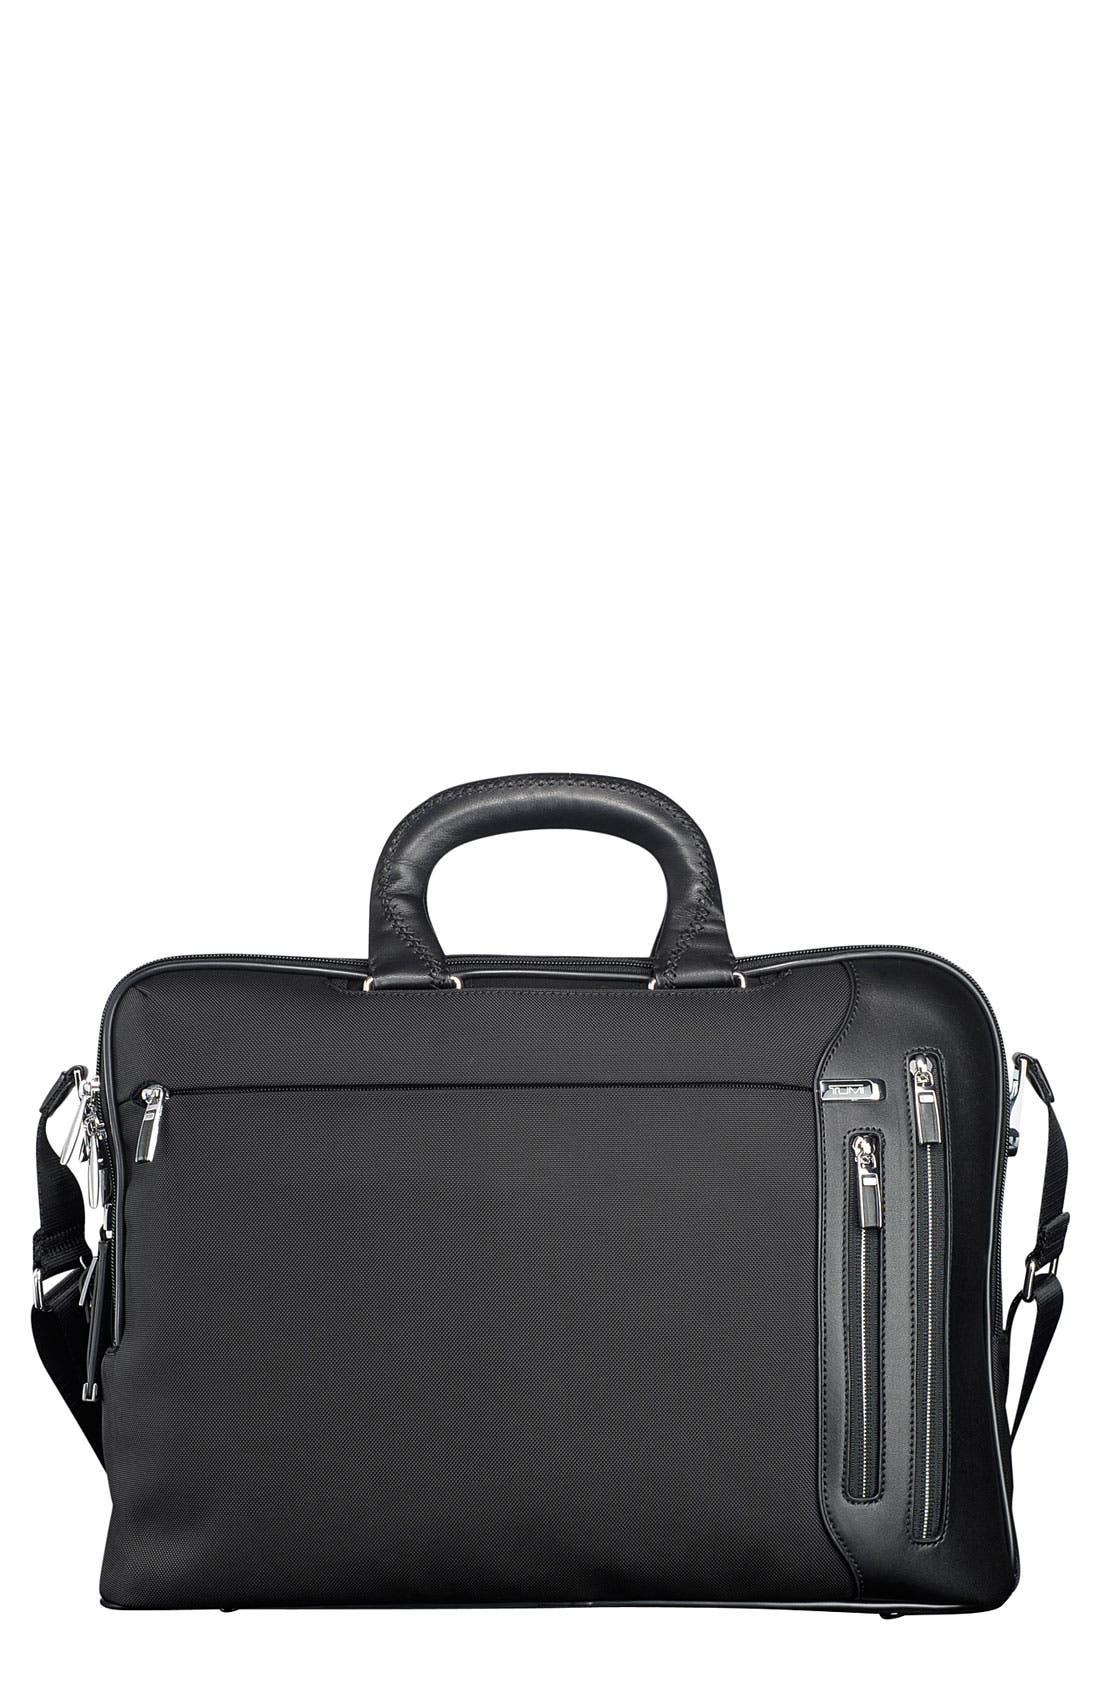 Alternate Image 1 Selected - Tumi 'Arrive - Narita' Slim Briefcase